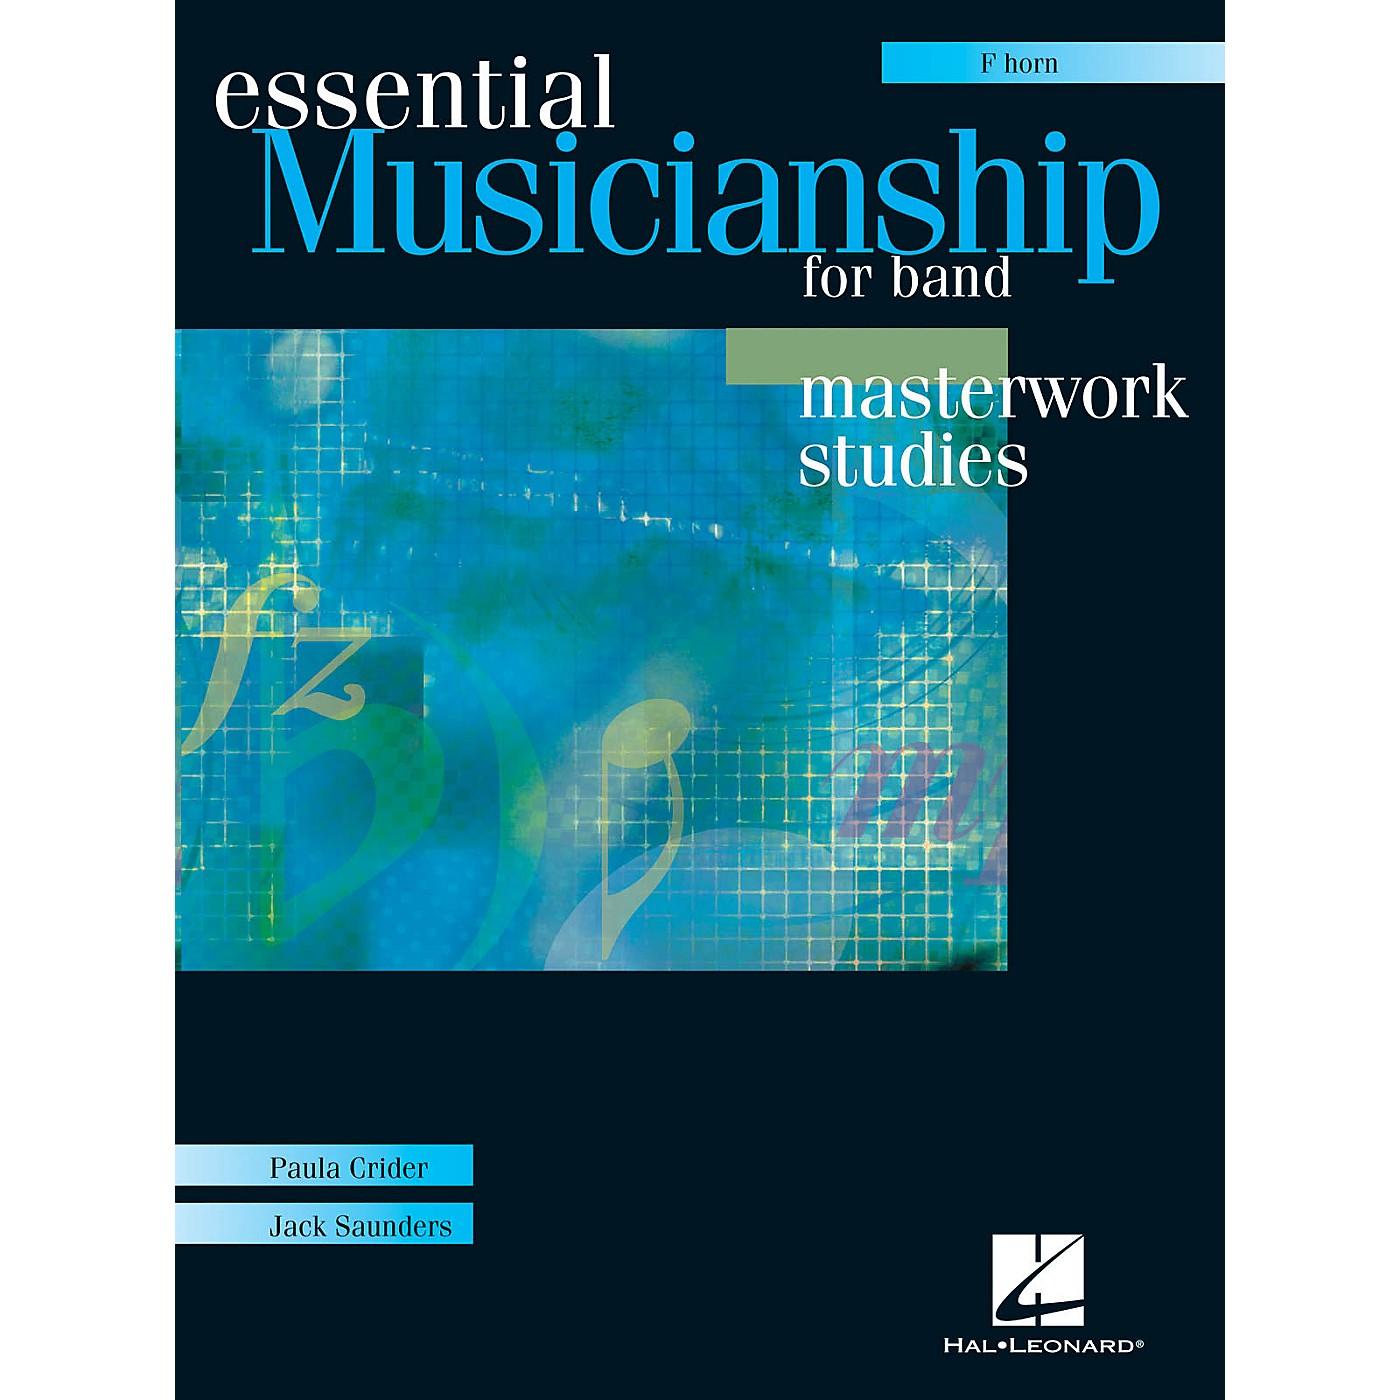 Hal Leonard Essential Musicianship for Band - Masterwork Studies (F Horn) Concert Band thumbnail